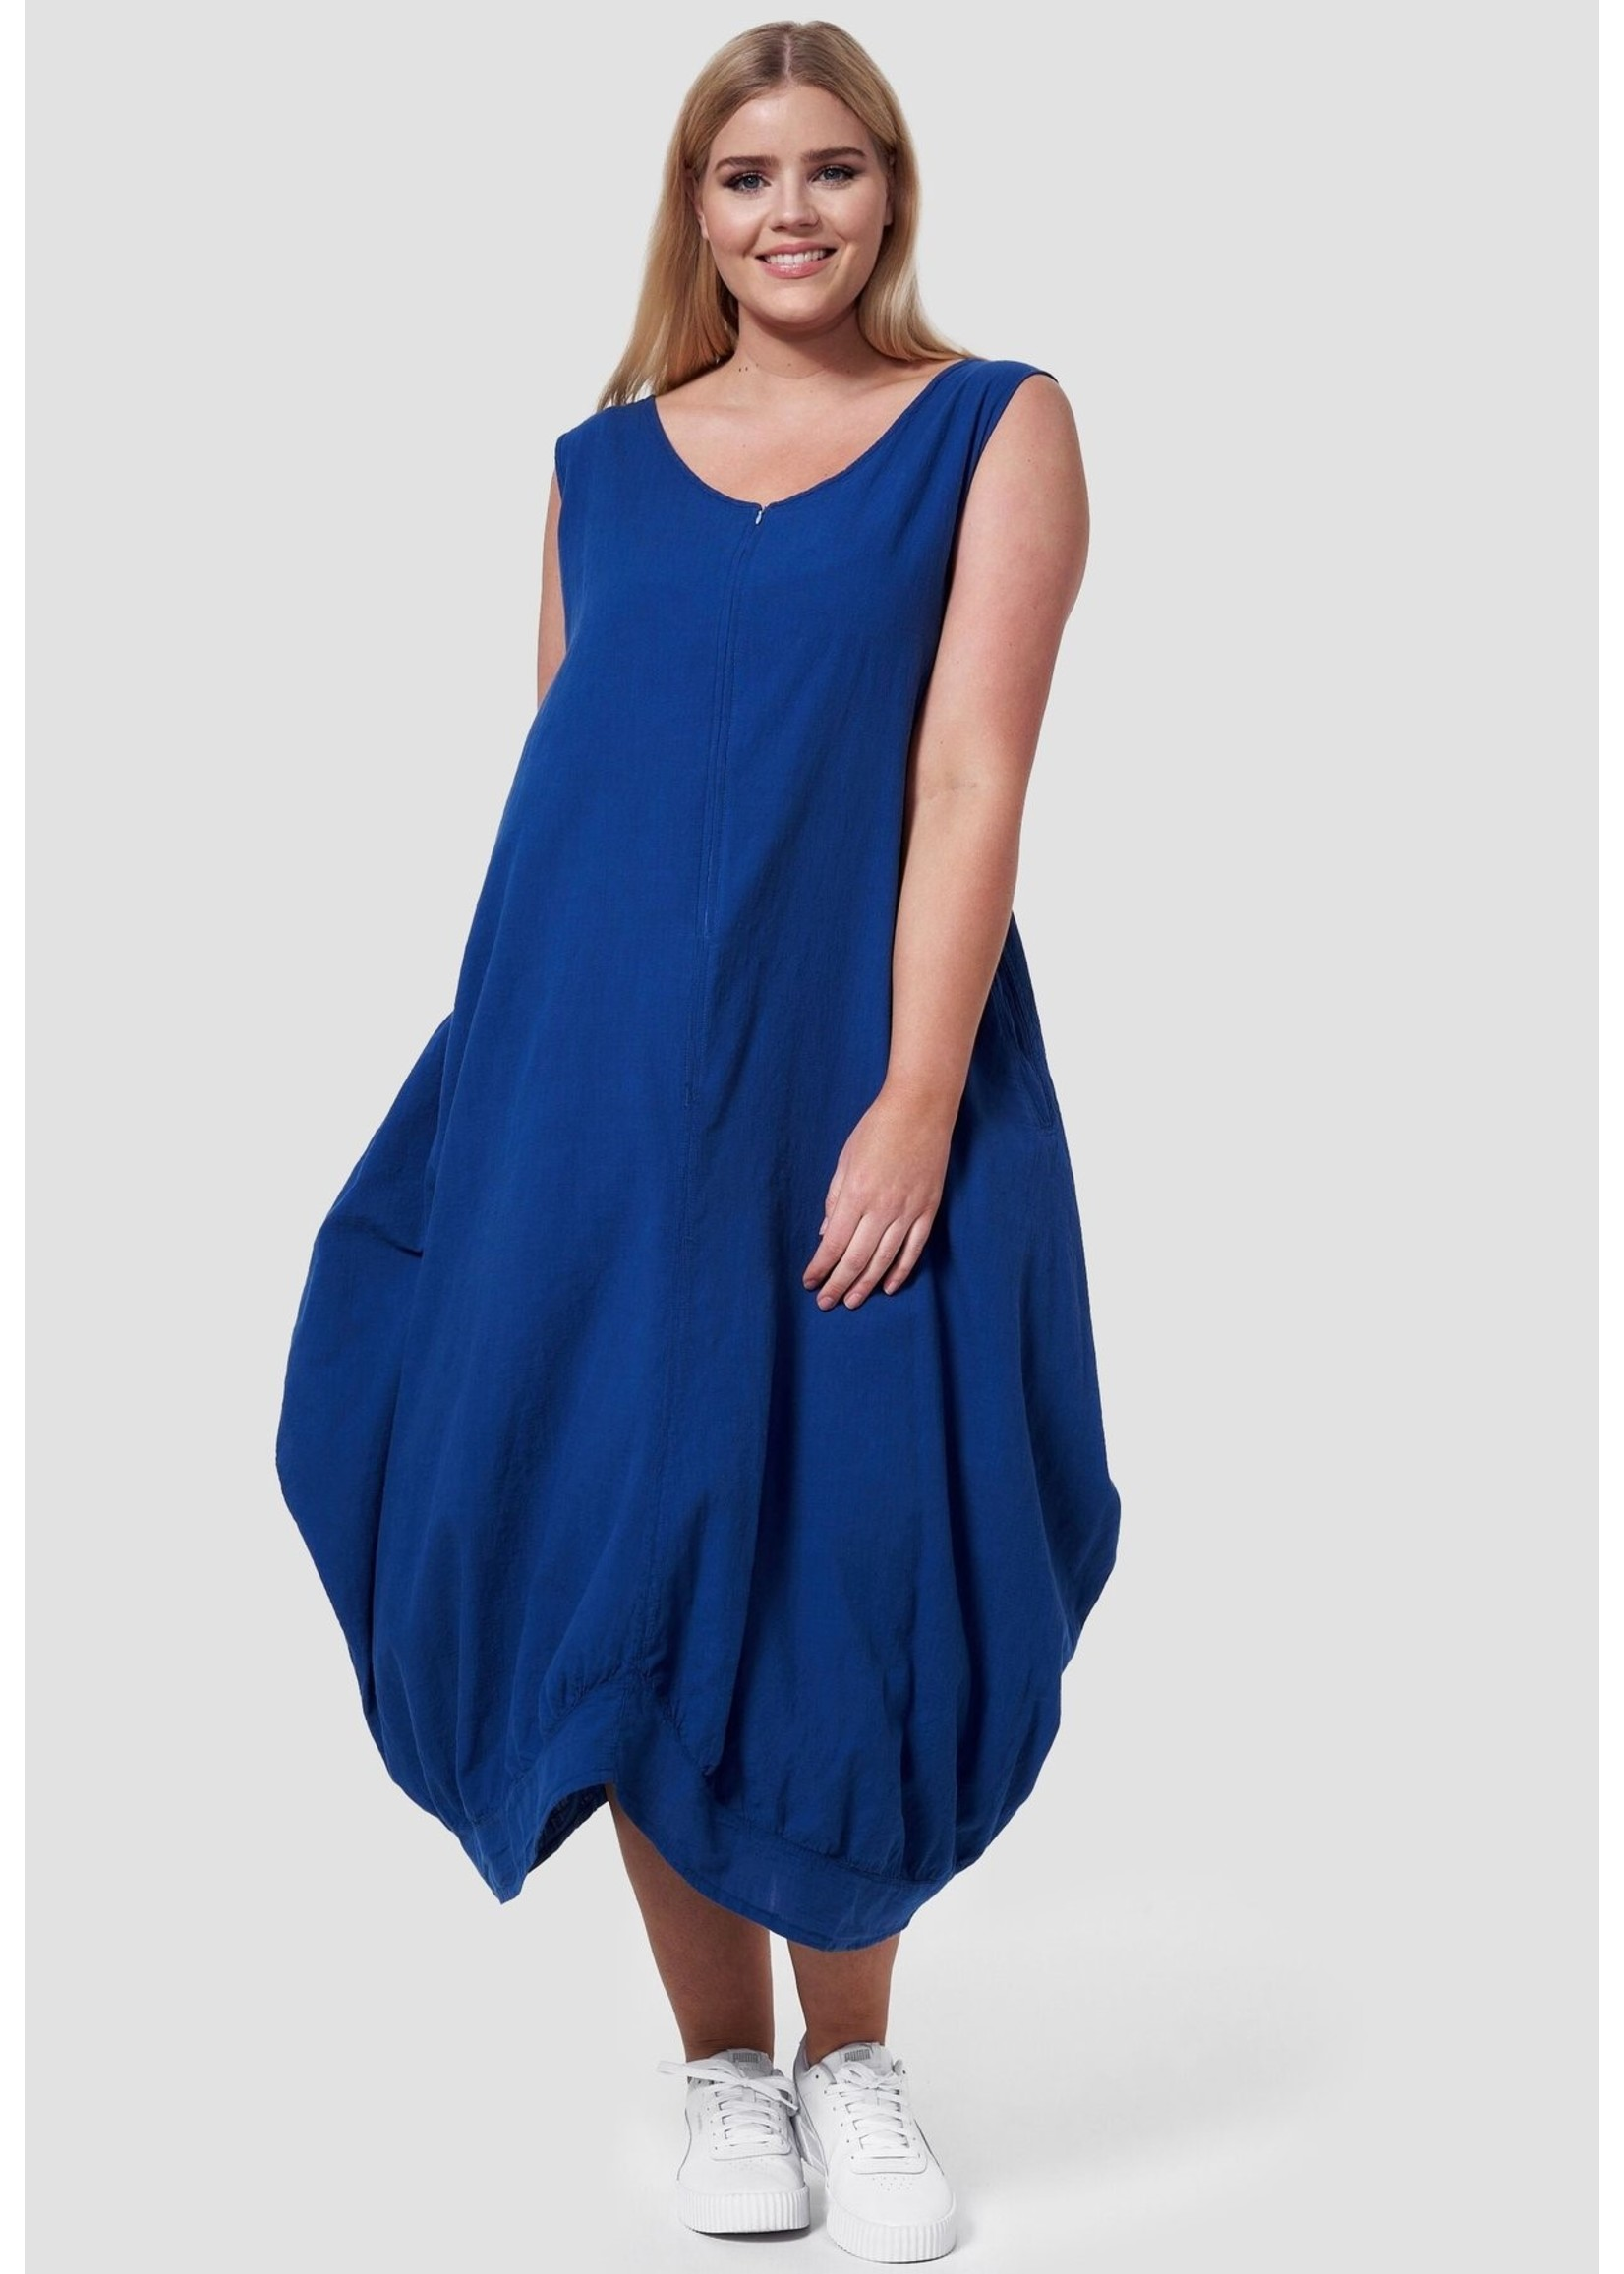 KEKOO 1236256 dress